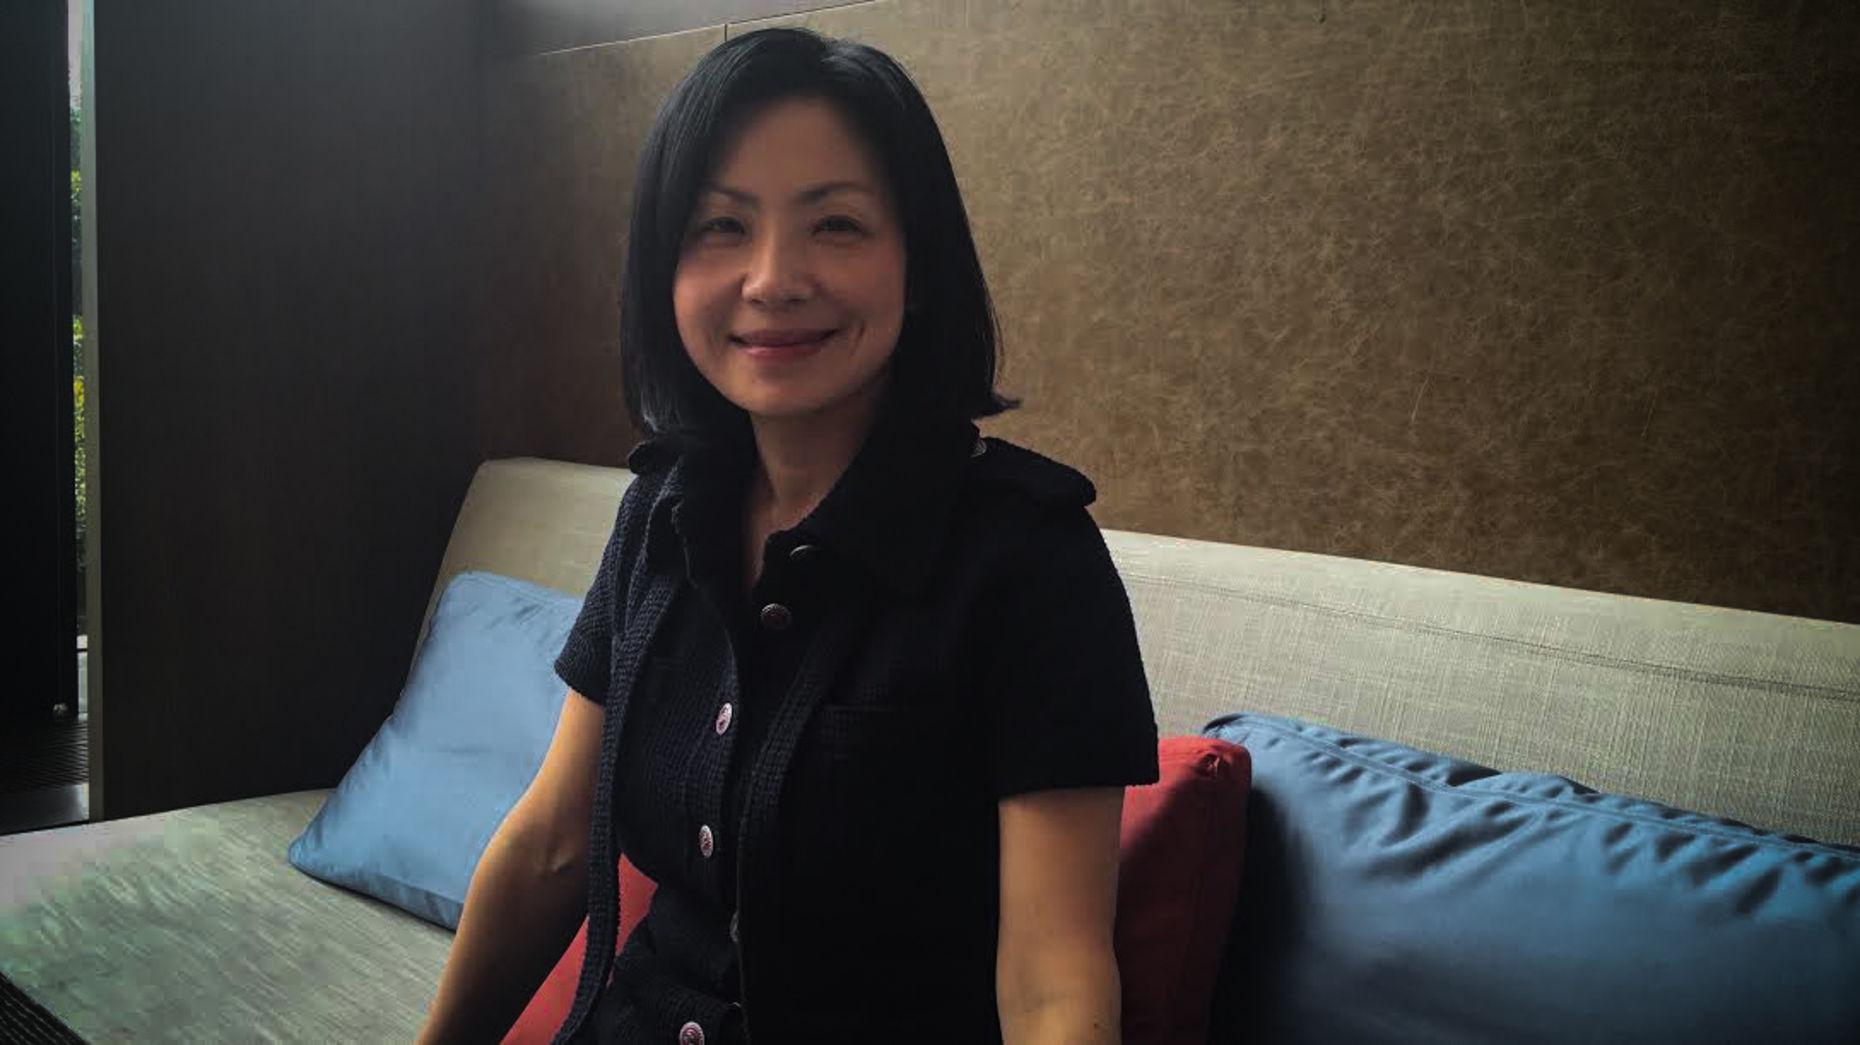 Magic Stone founder Jenny Zeng. Photo by Jessica E. Lessin.